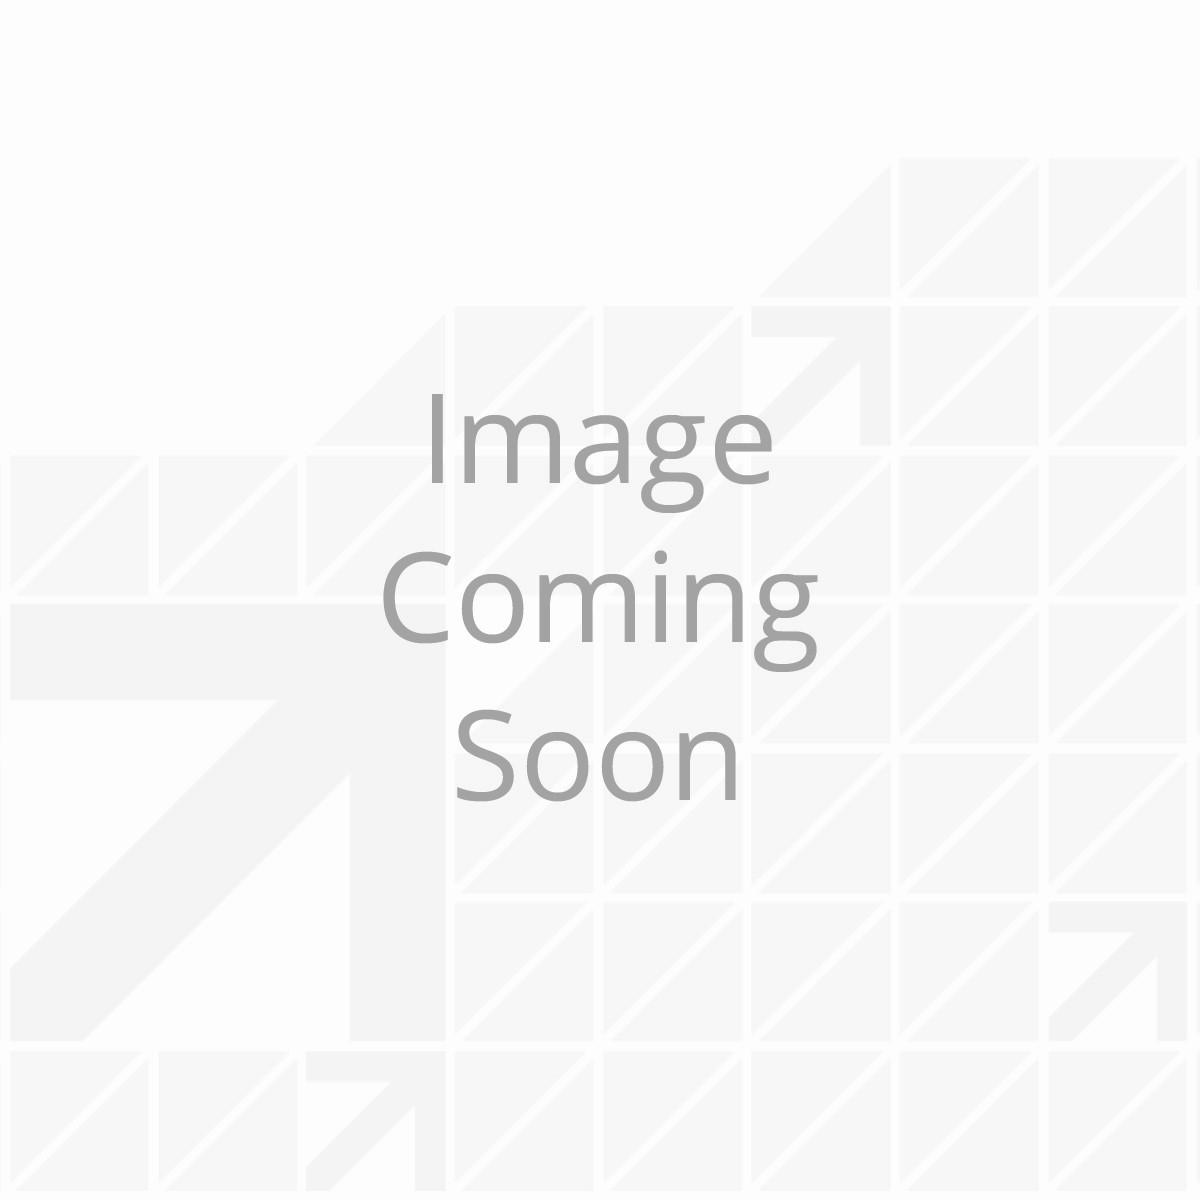 SuperFlex Patch Kit, Almond (6.0 SqFt)